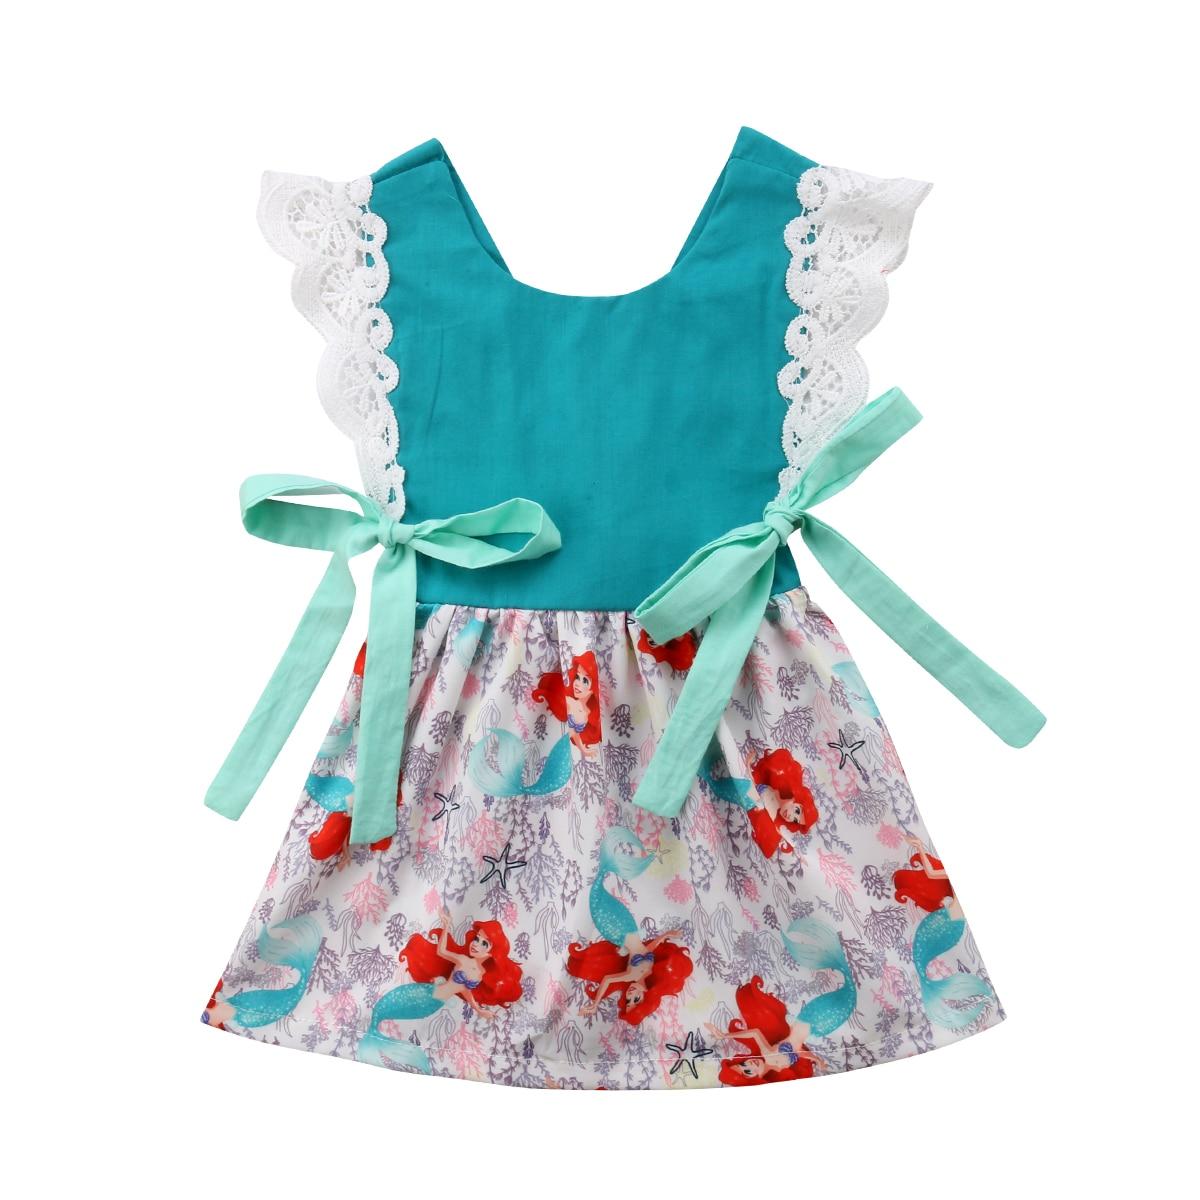 US Toddler Kids Baby Girls Summer Mermaid Princess Party Pageant Dress Sundress